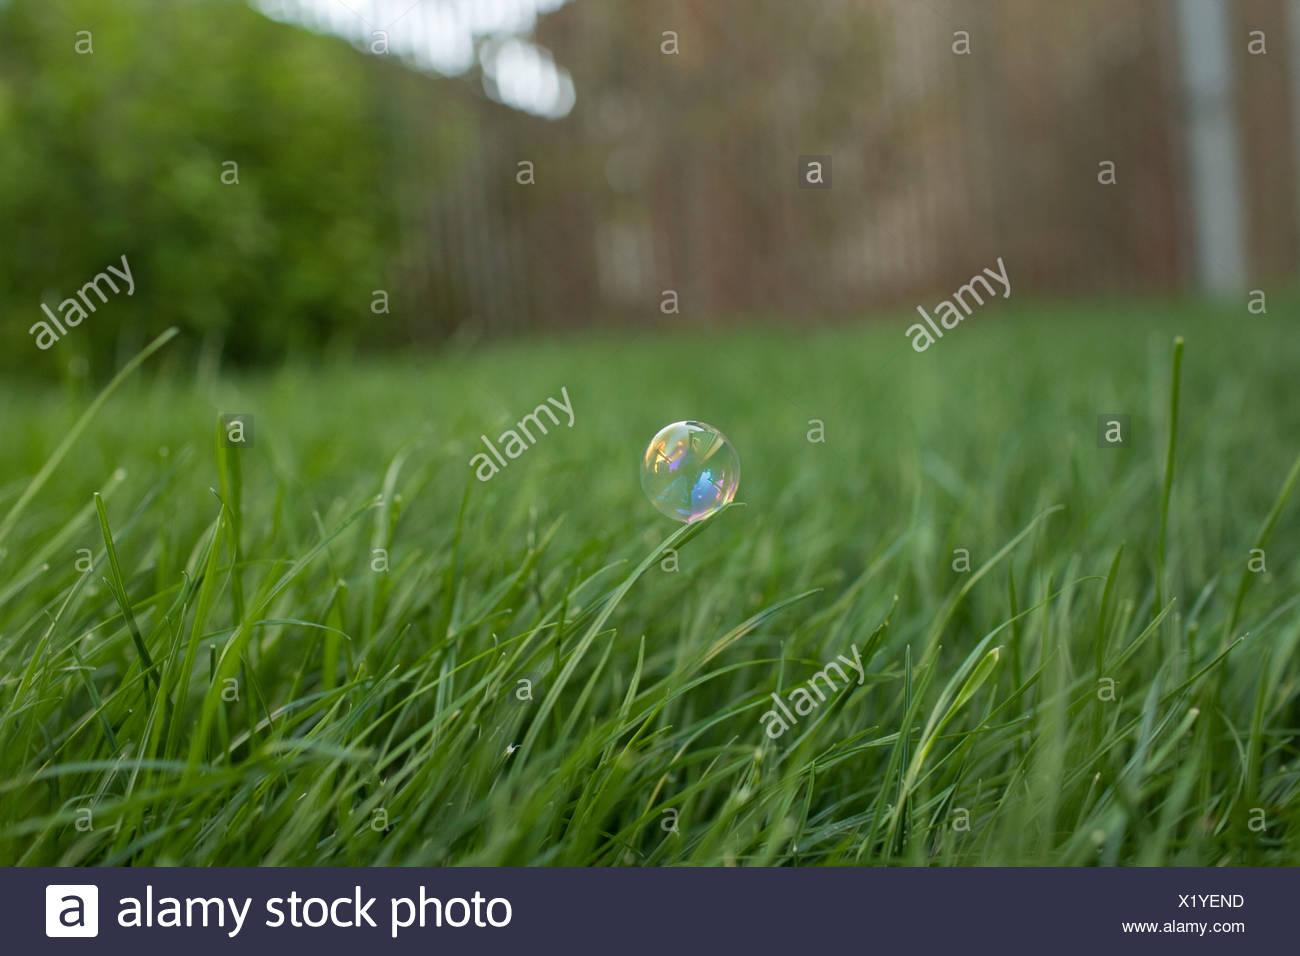 Burbuja en pasto Imagen De Stock